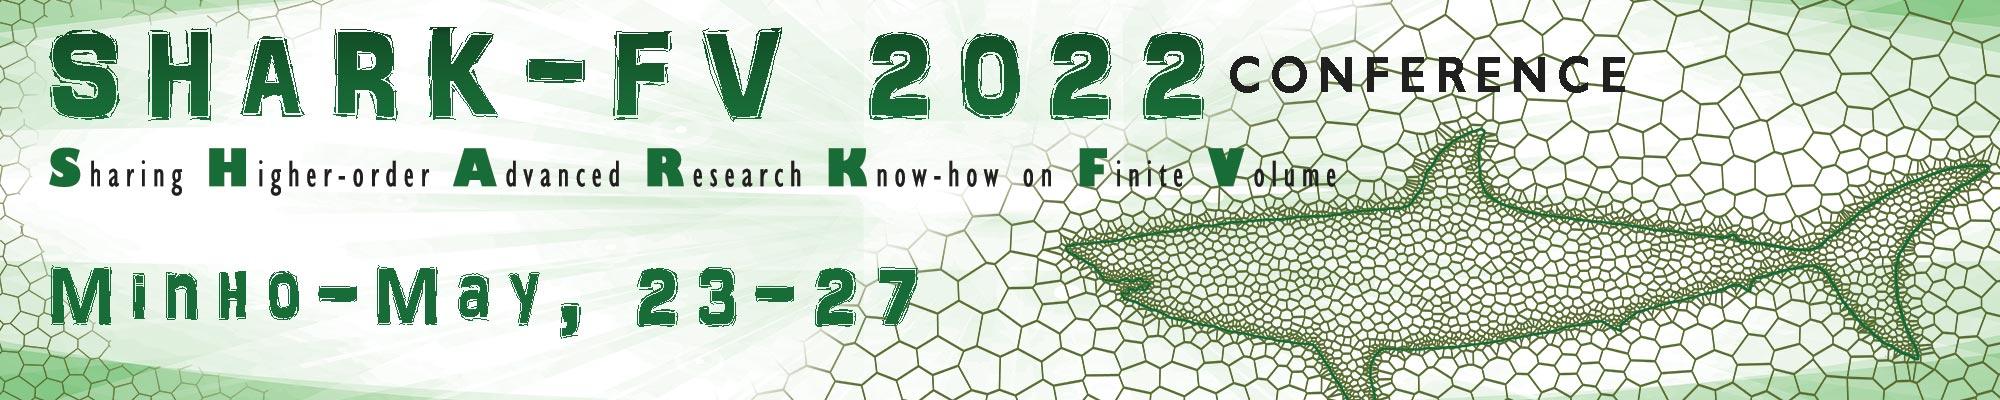 header shark 2022 mathematics conference